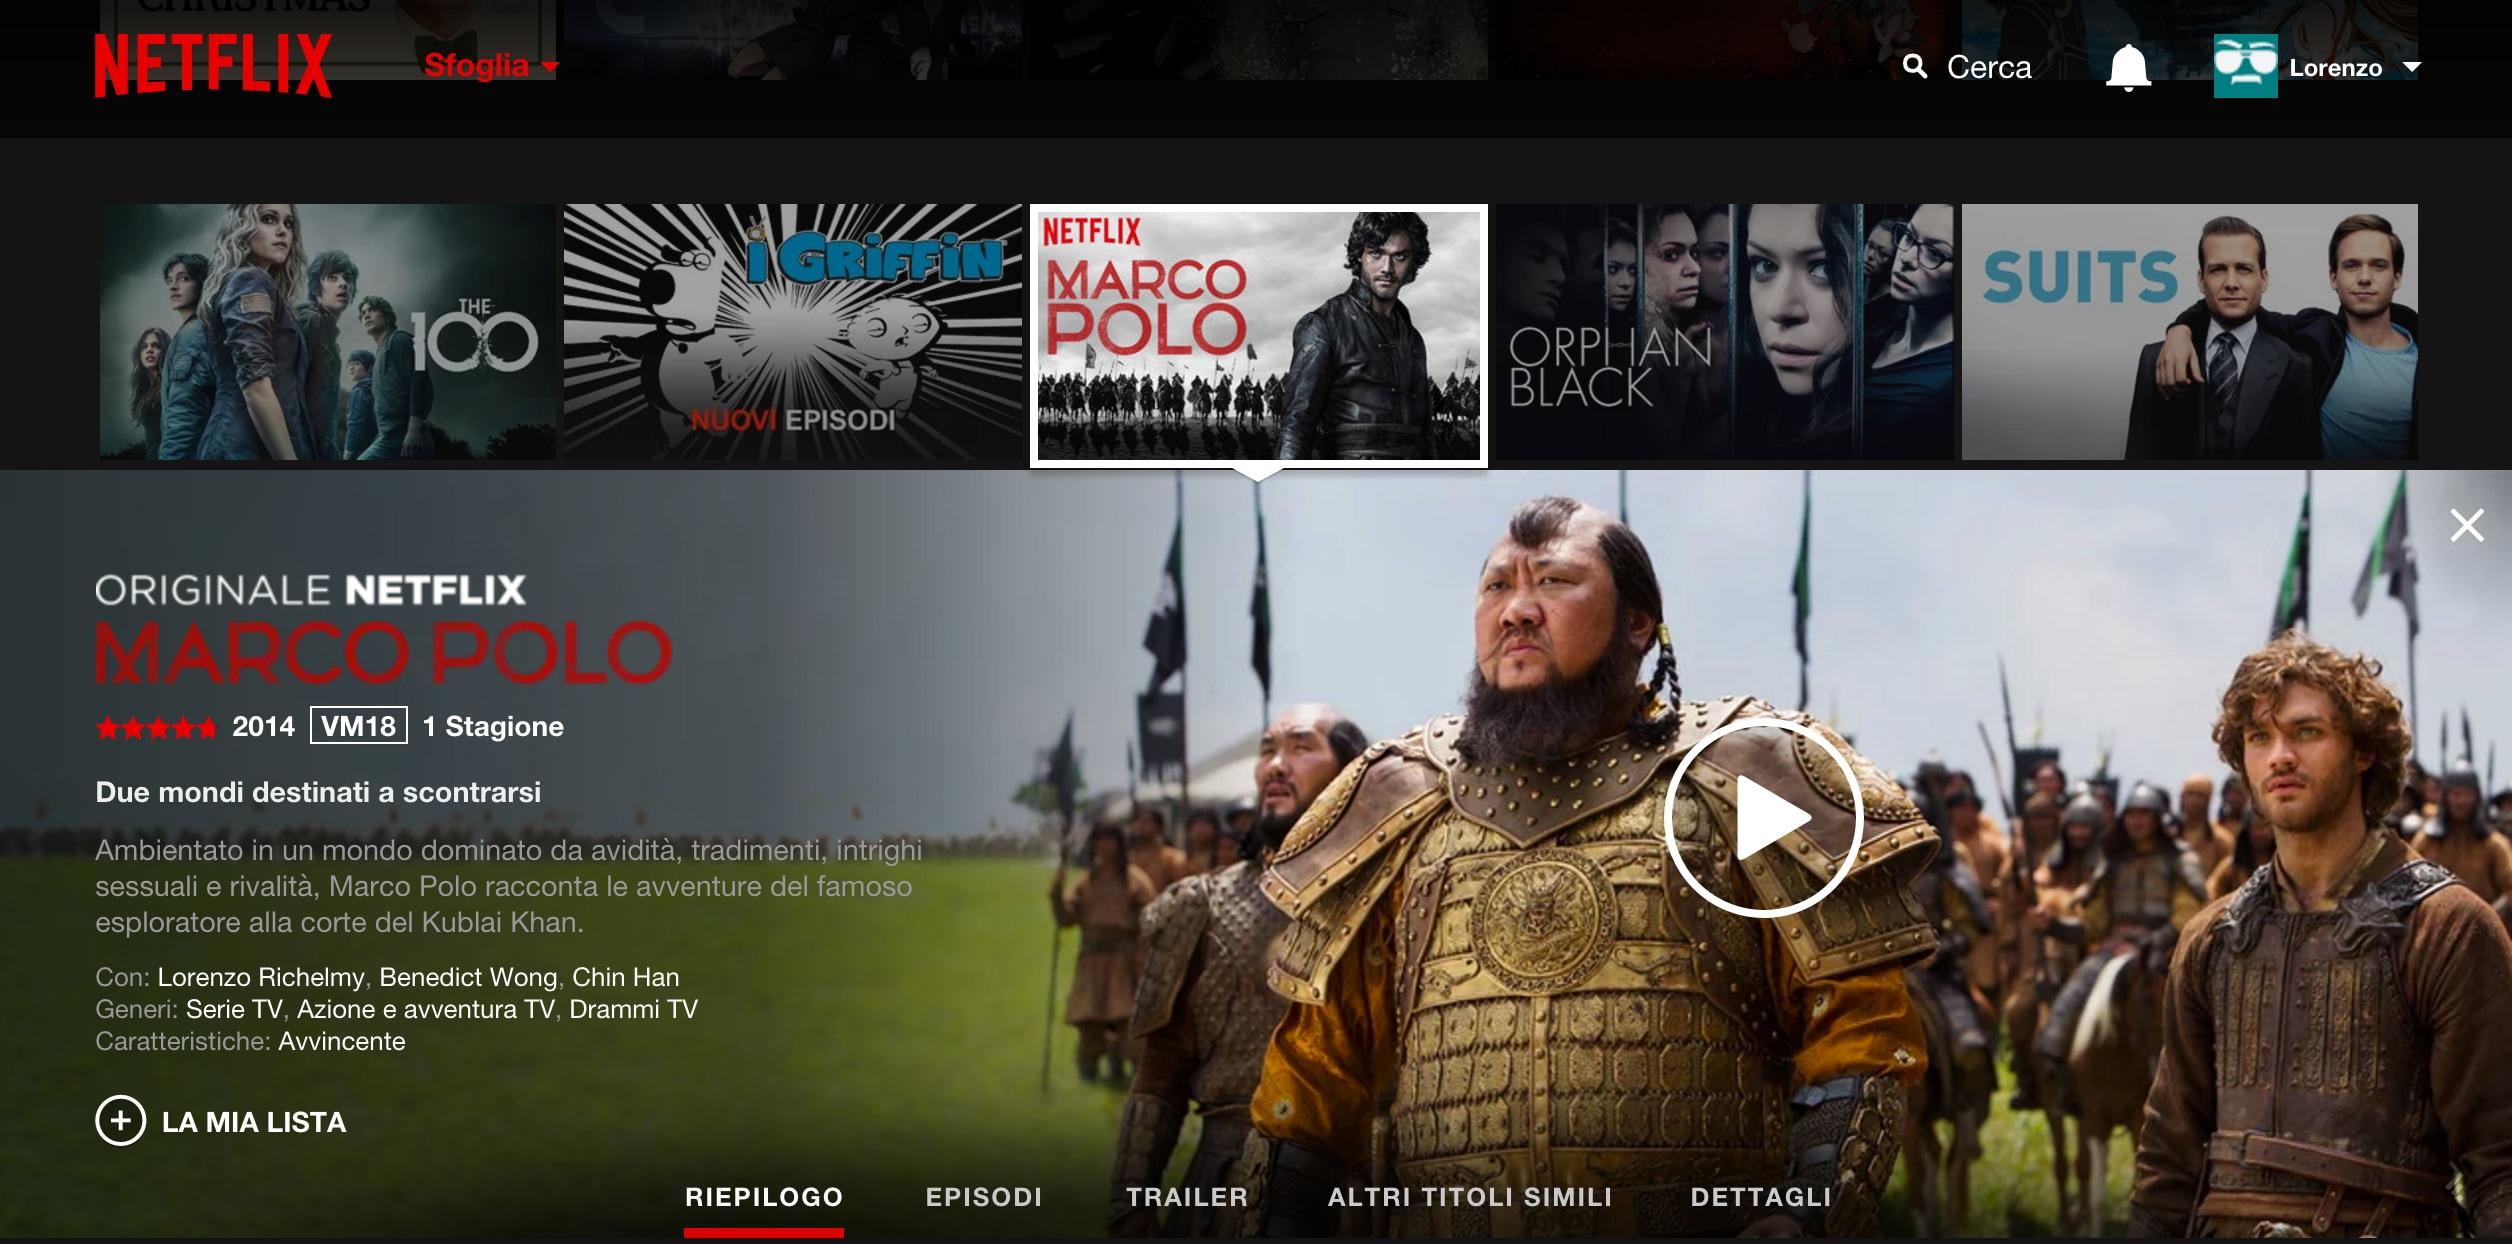 Netflix confronto – 1